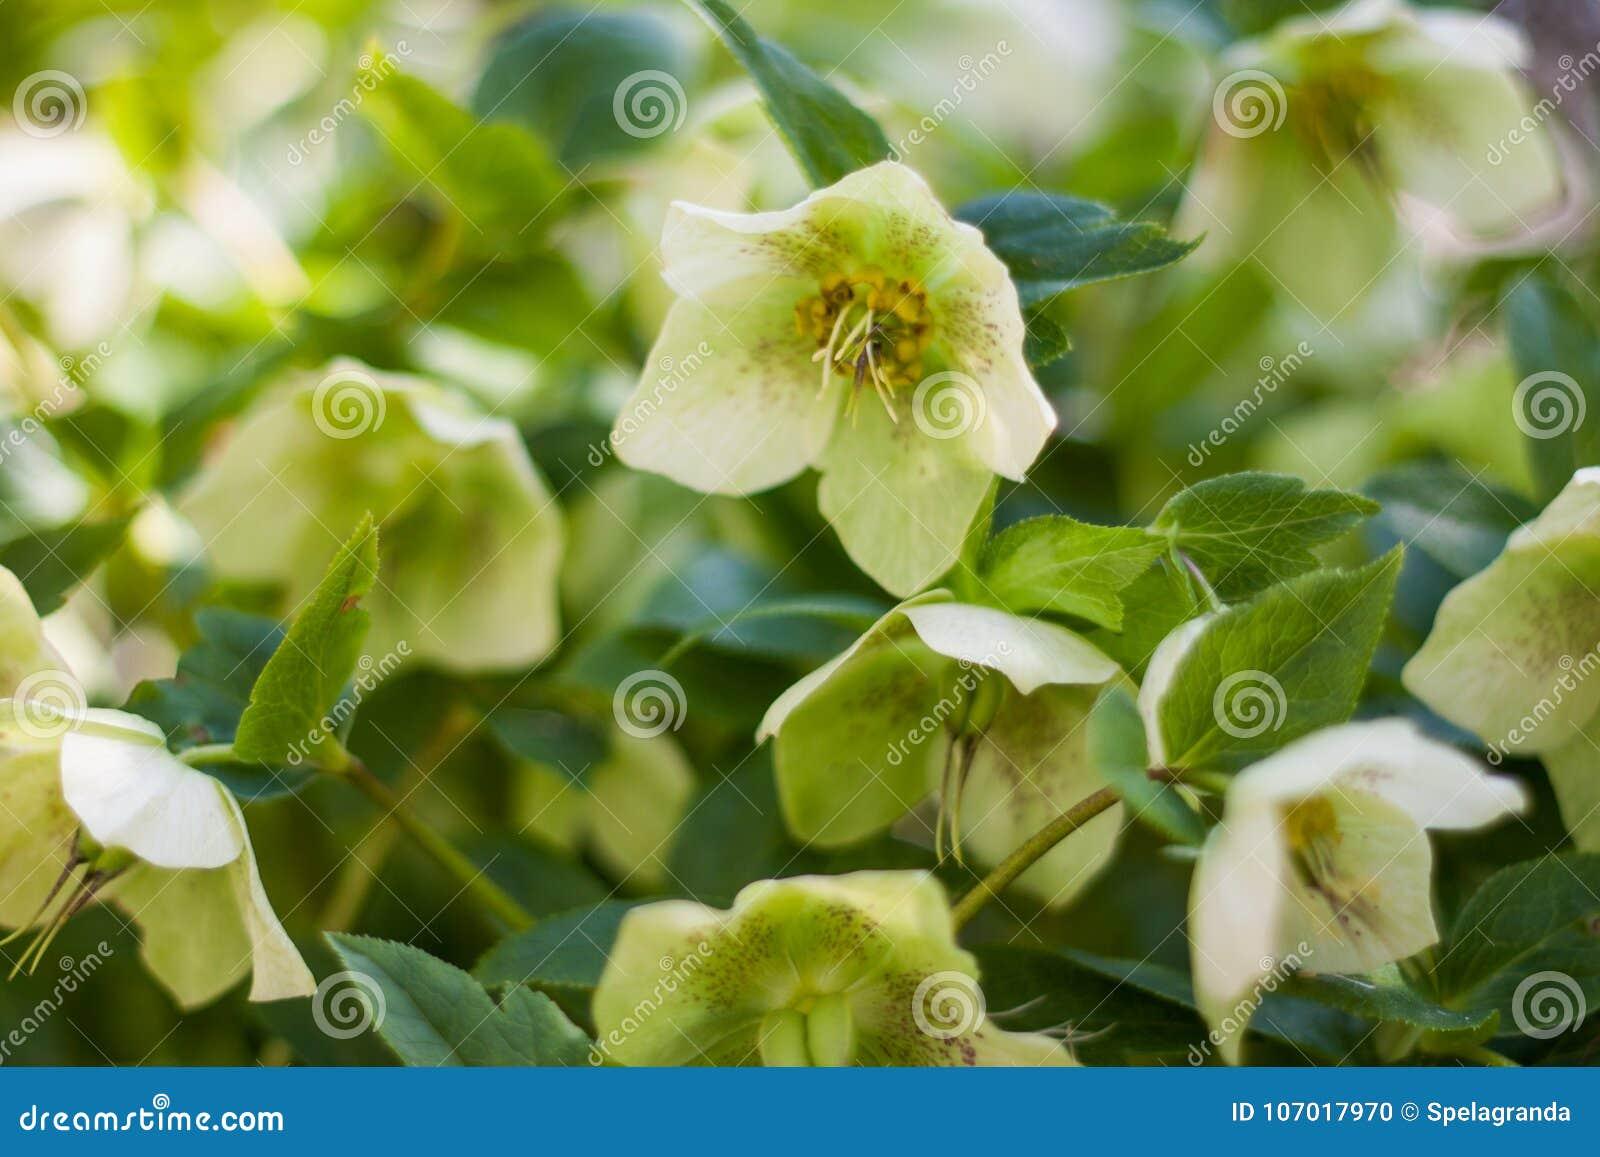 Grüner Hellebore blüht in voller Blüte